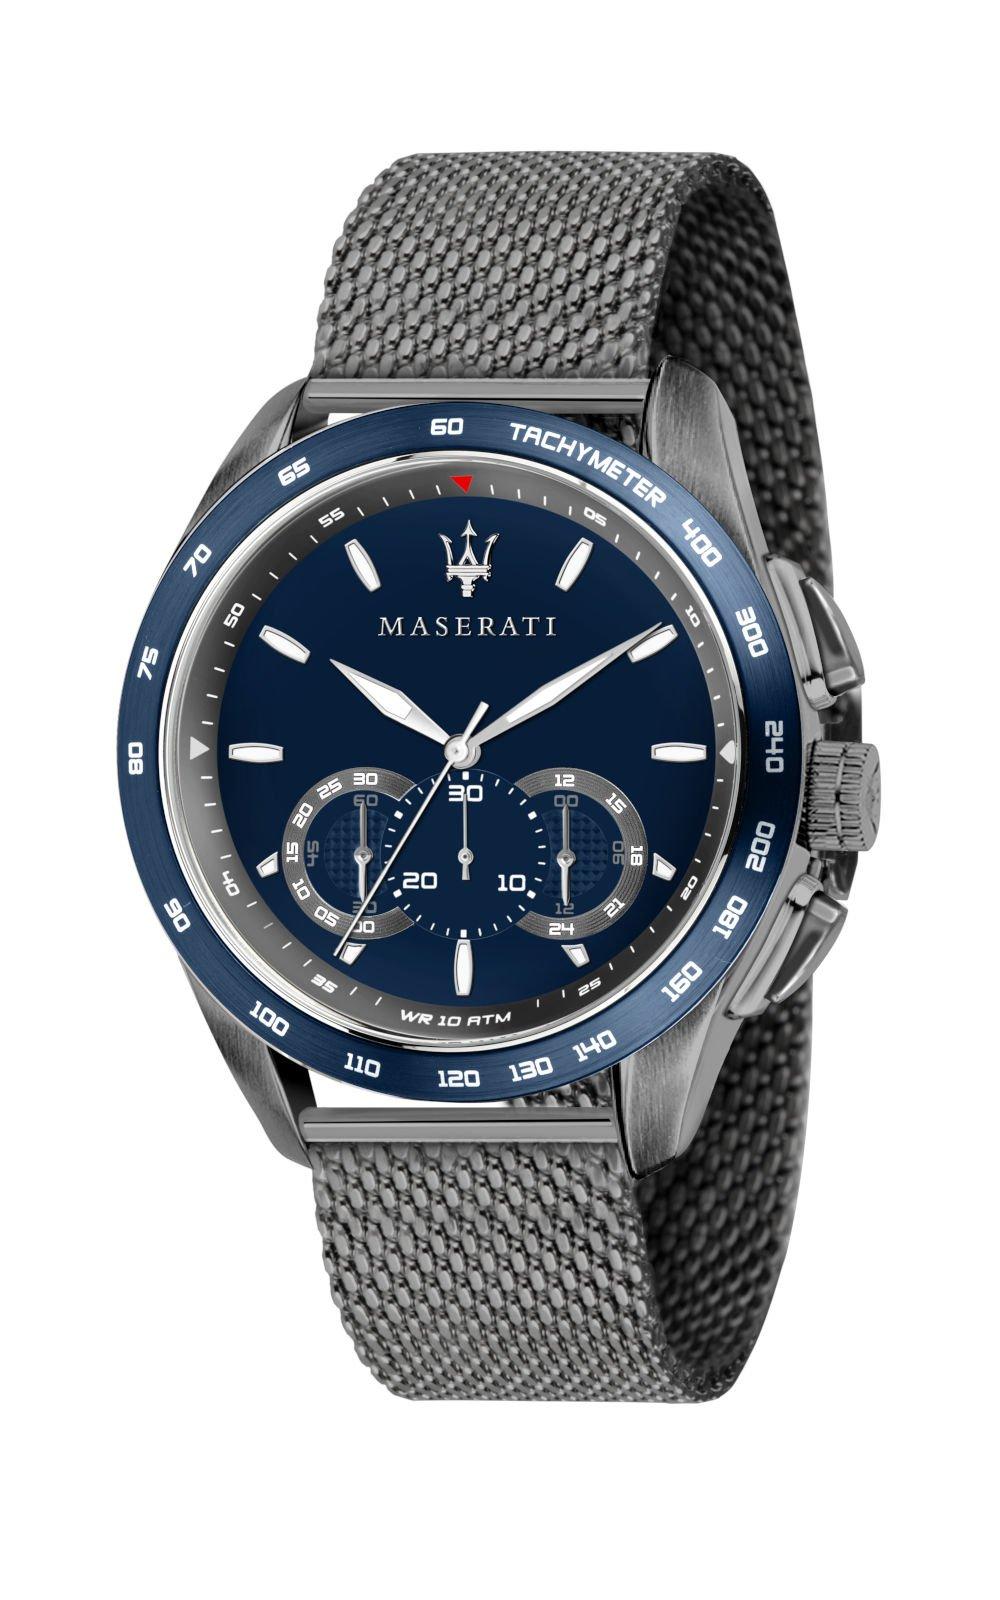 MASERATI TRAGUARDO R8873612009 Ανδρικό Ρολόι Quartz Χρονογράφος Ακριβείας be955d6b97b